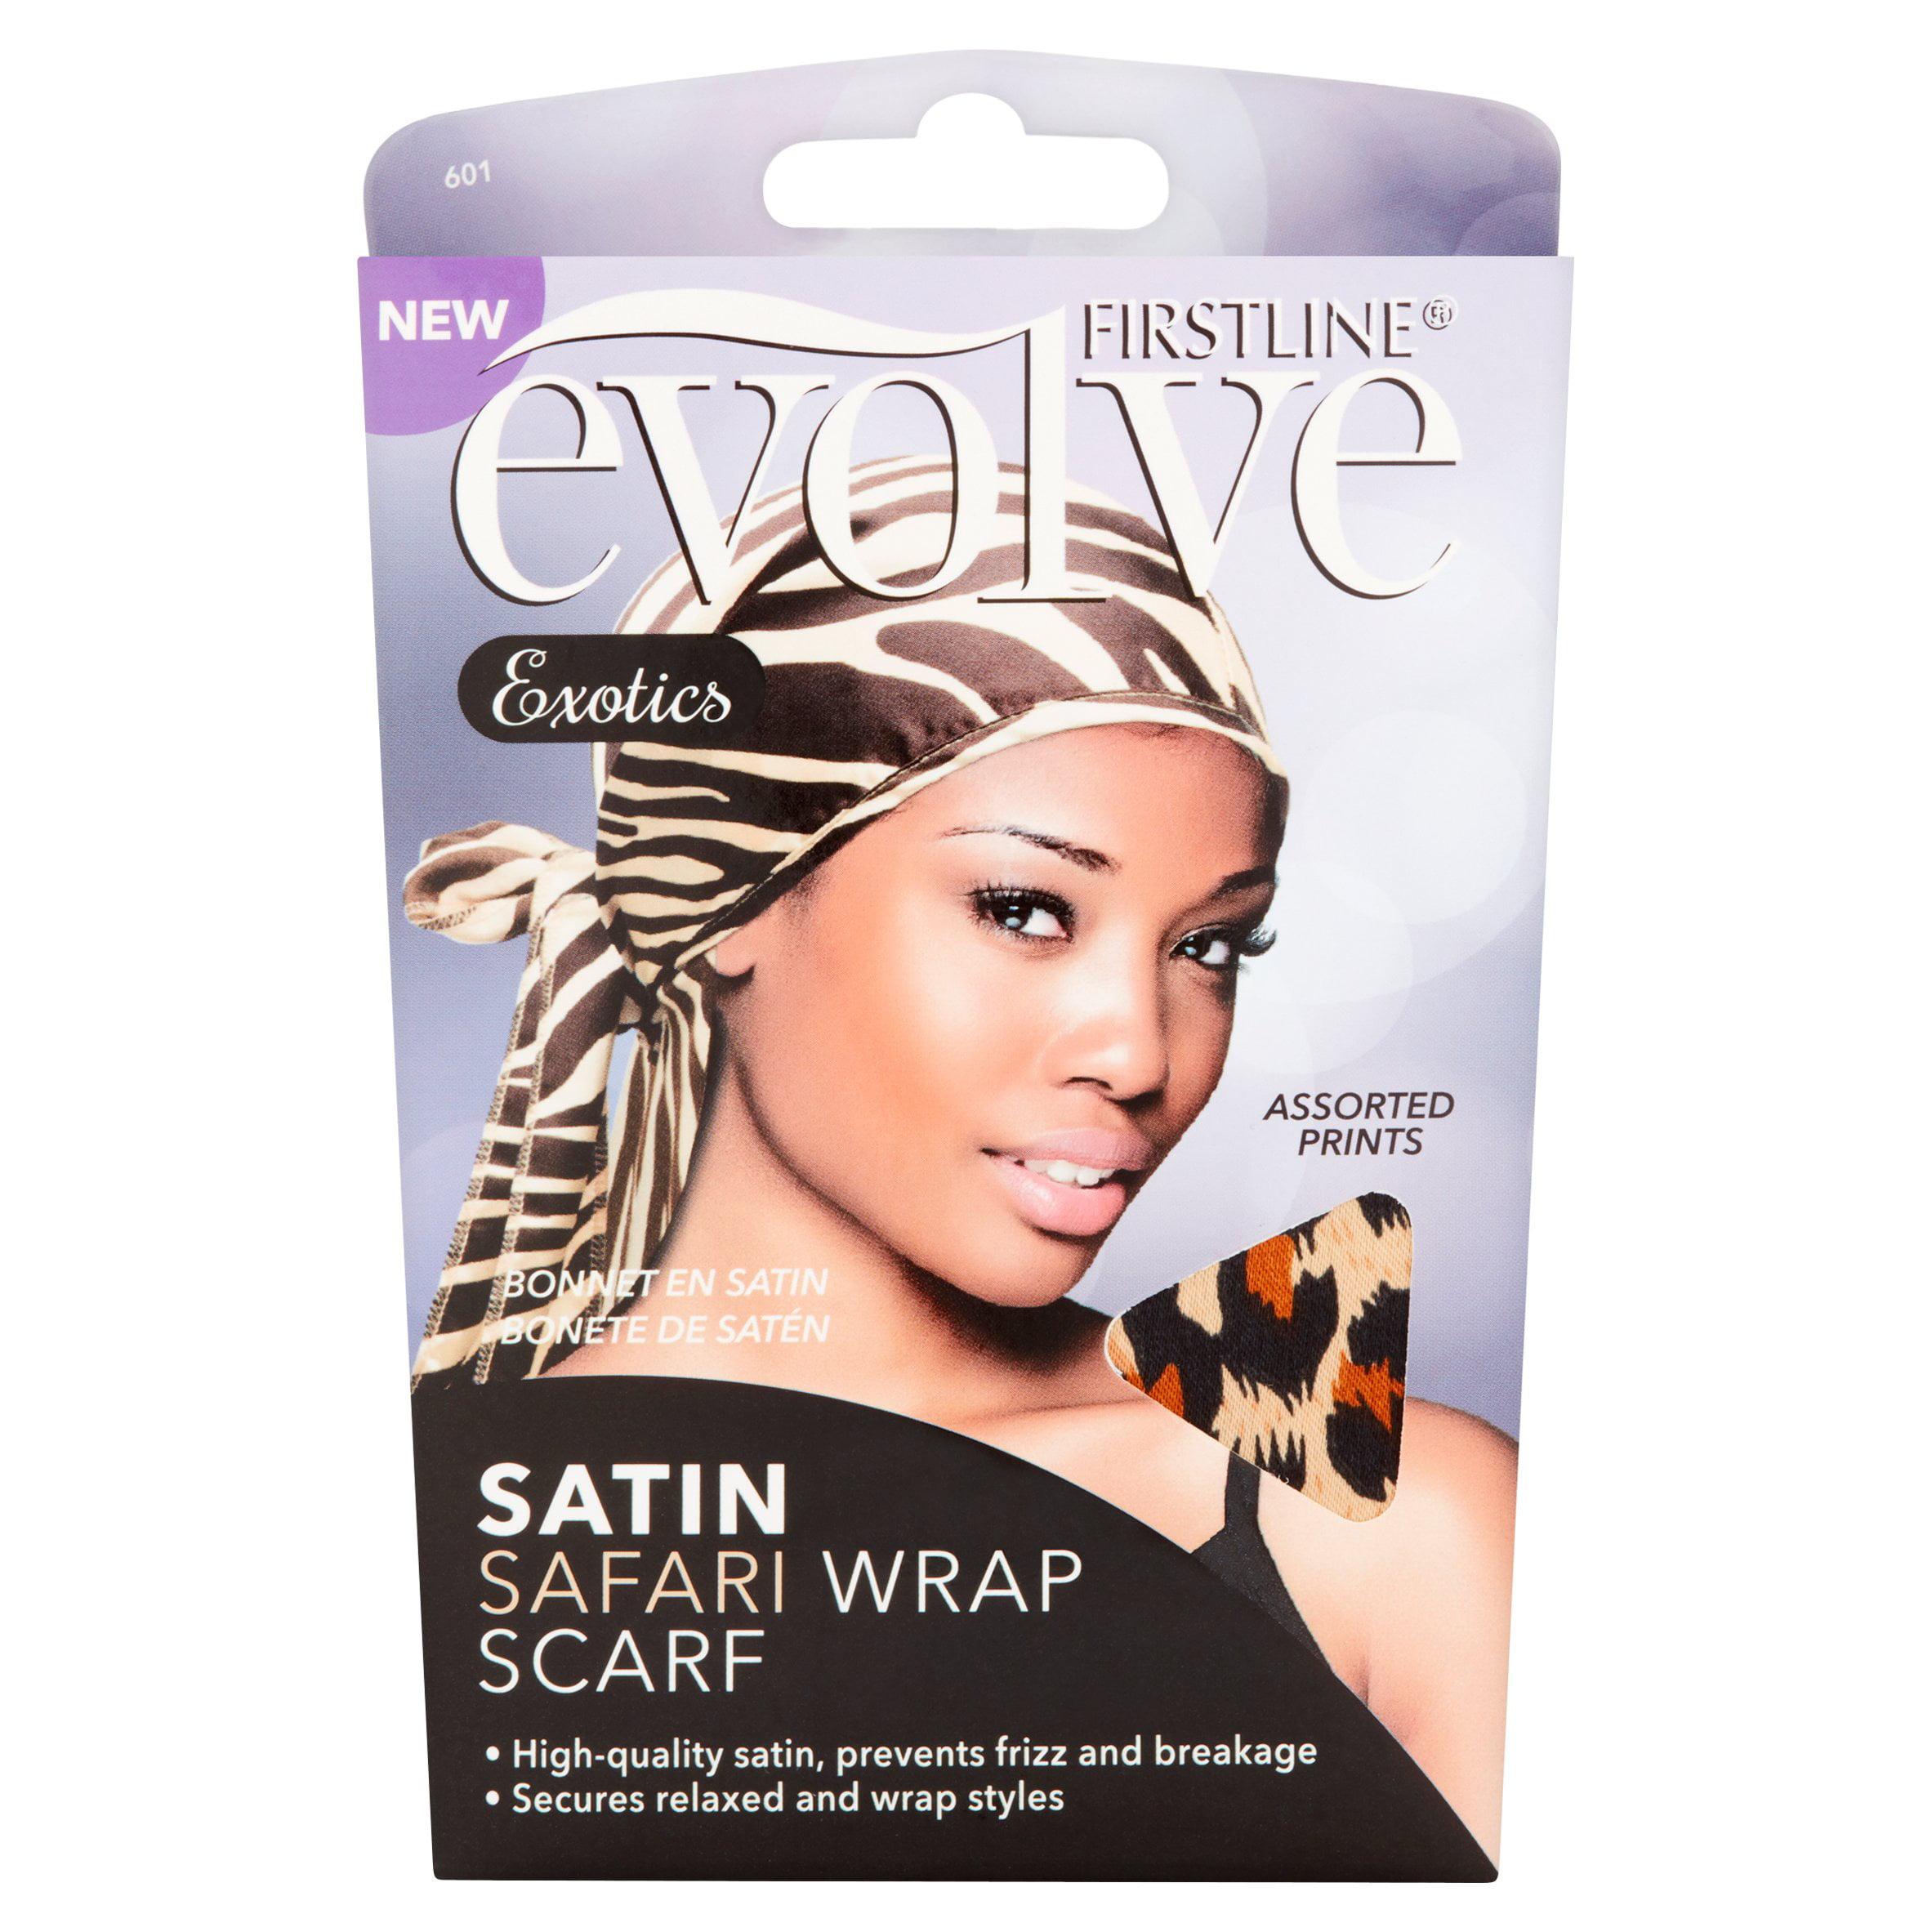 Firstline Evolve Exotics Satin Safari Wrap Scarf